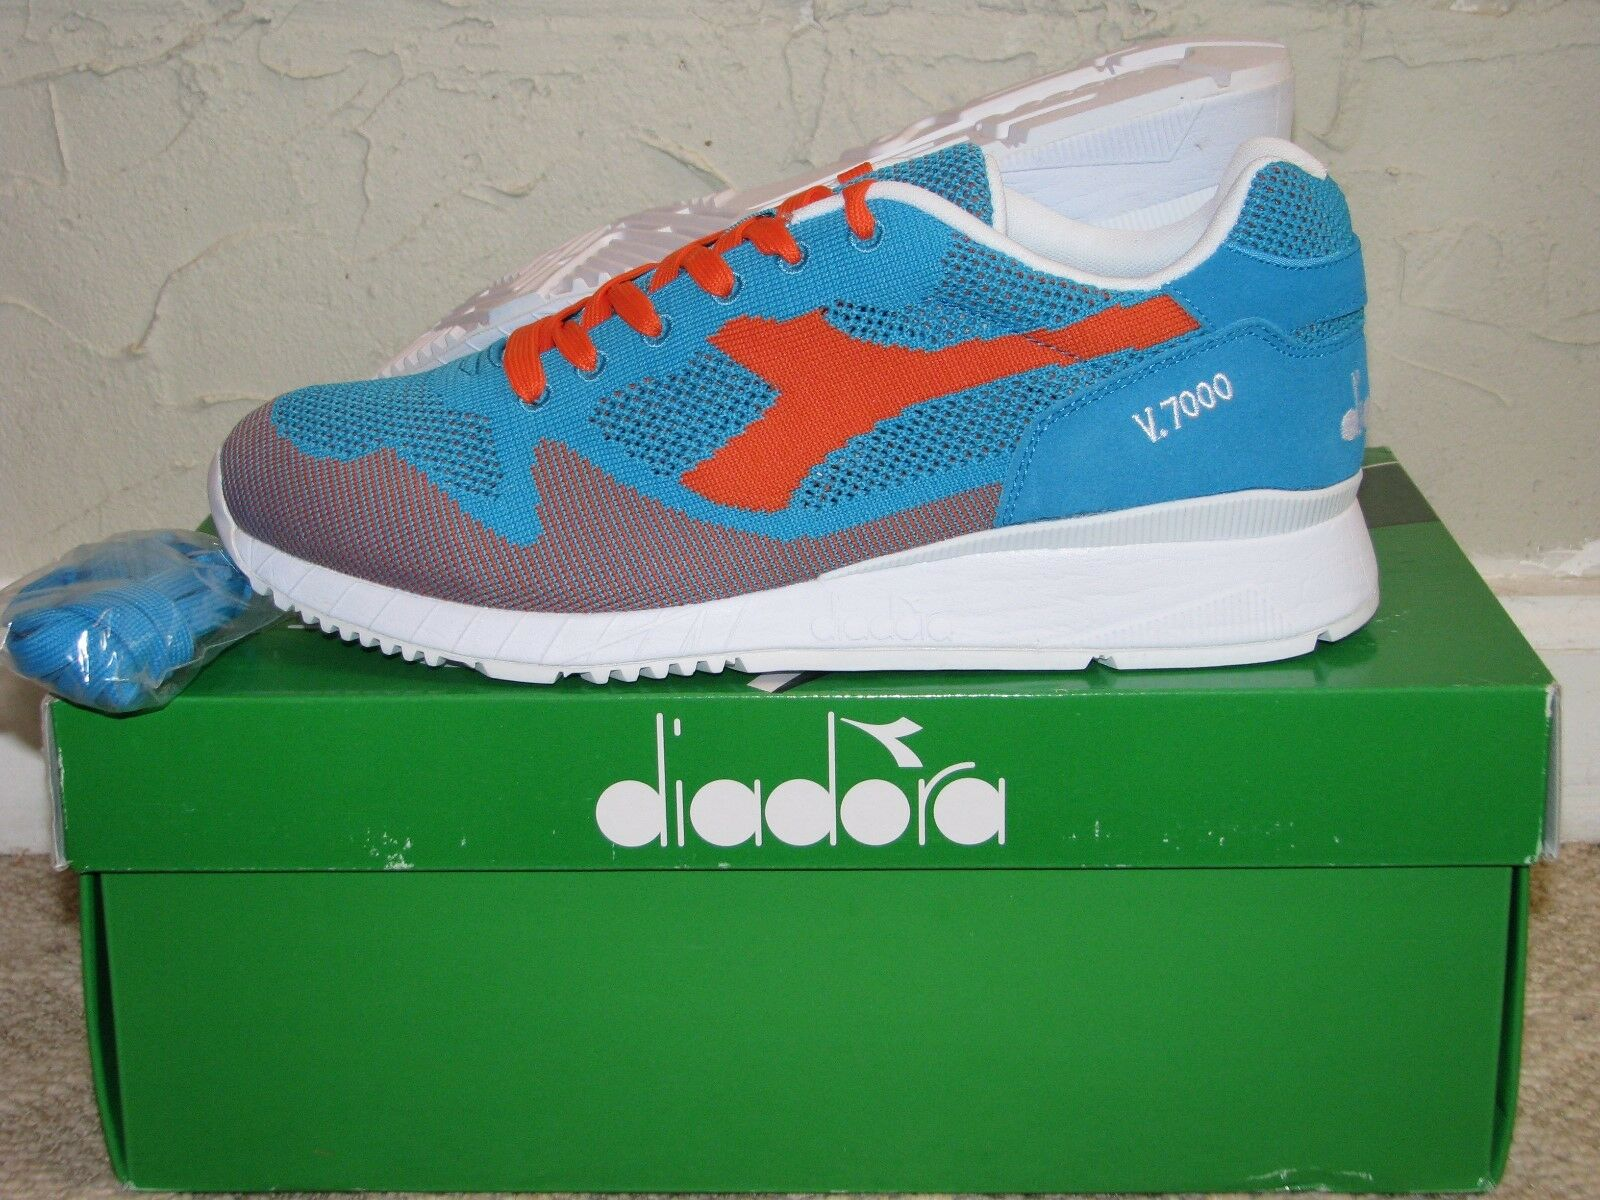 Diadora Tejido V7000 azul naranja Mens tamaño 10 Ds Nuevo  501.170476-01 C6893